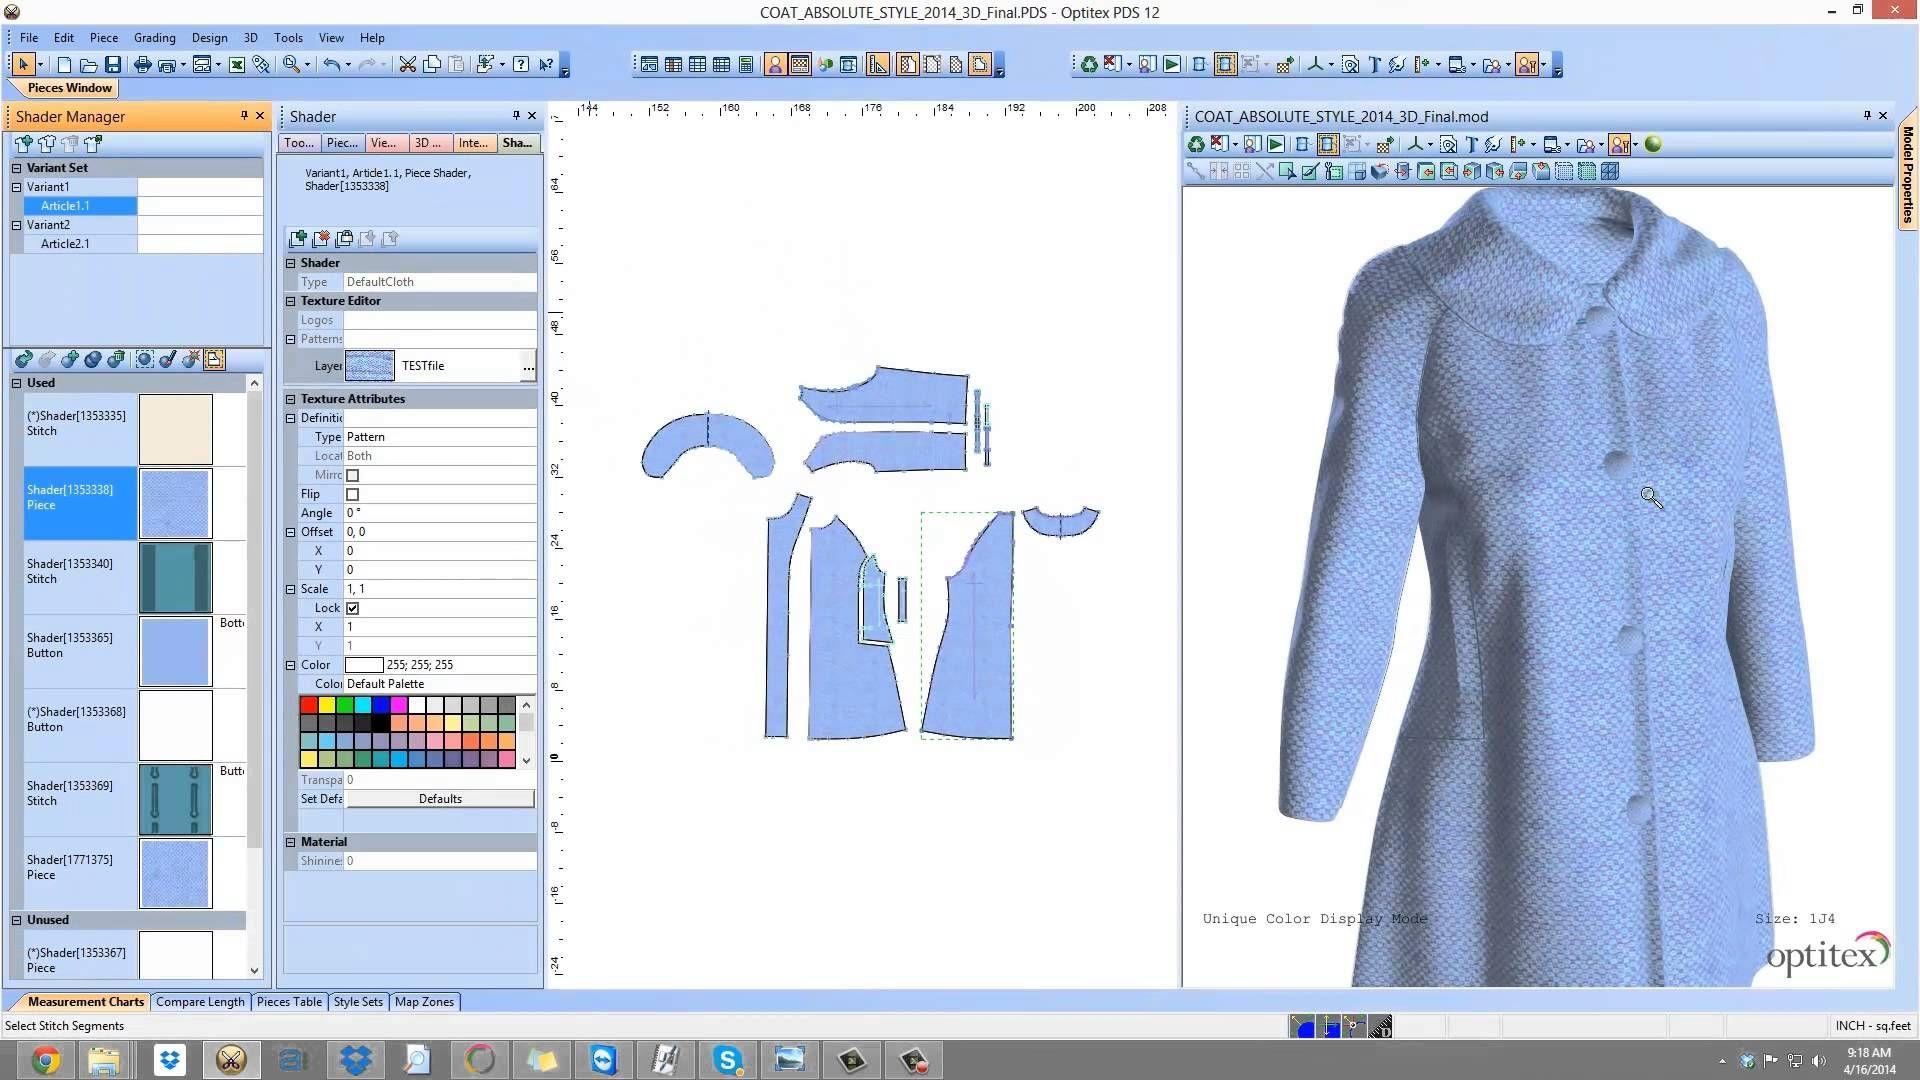 Optitex Virtual Product 3d Fashion Design Software Http Www Optitex Com En Clothing Design Software Fashion Design Software Garment Industry